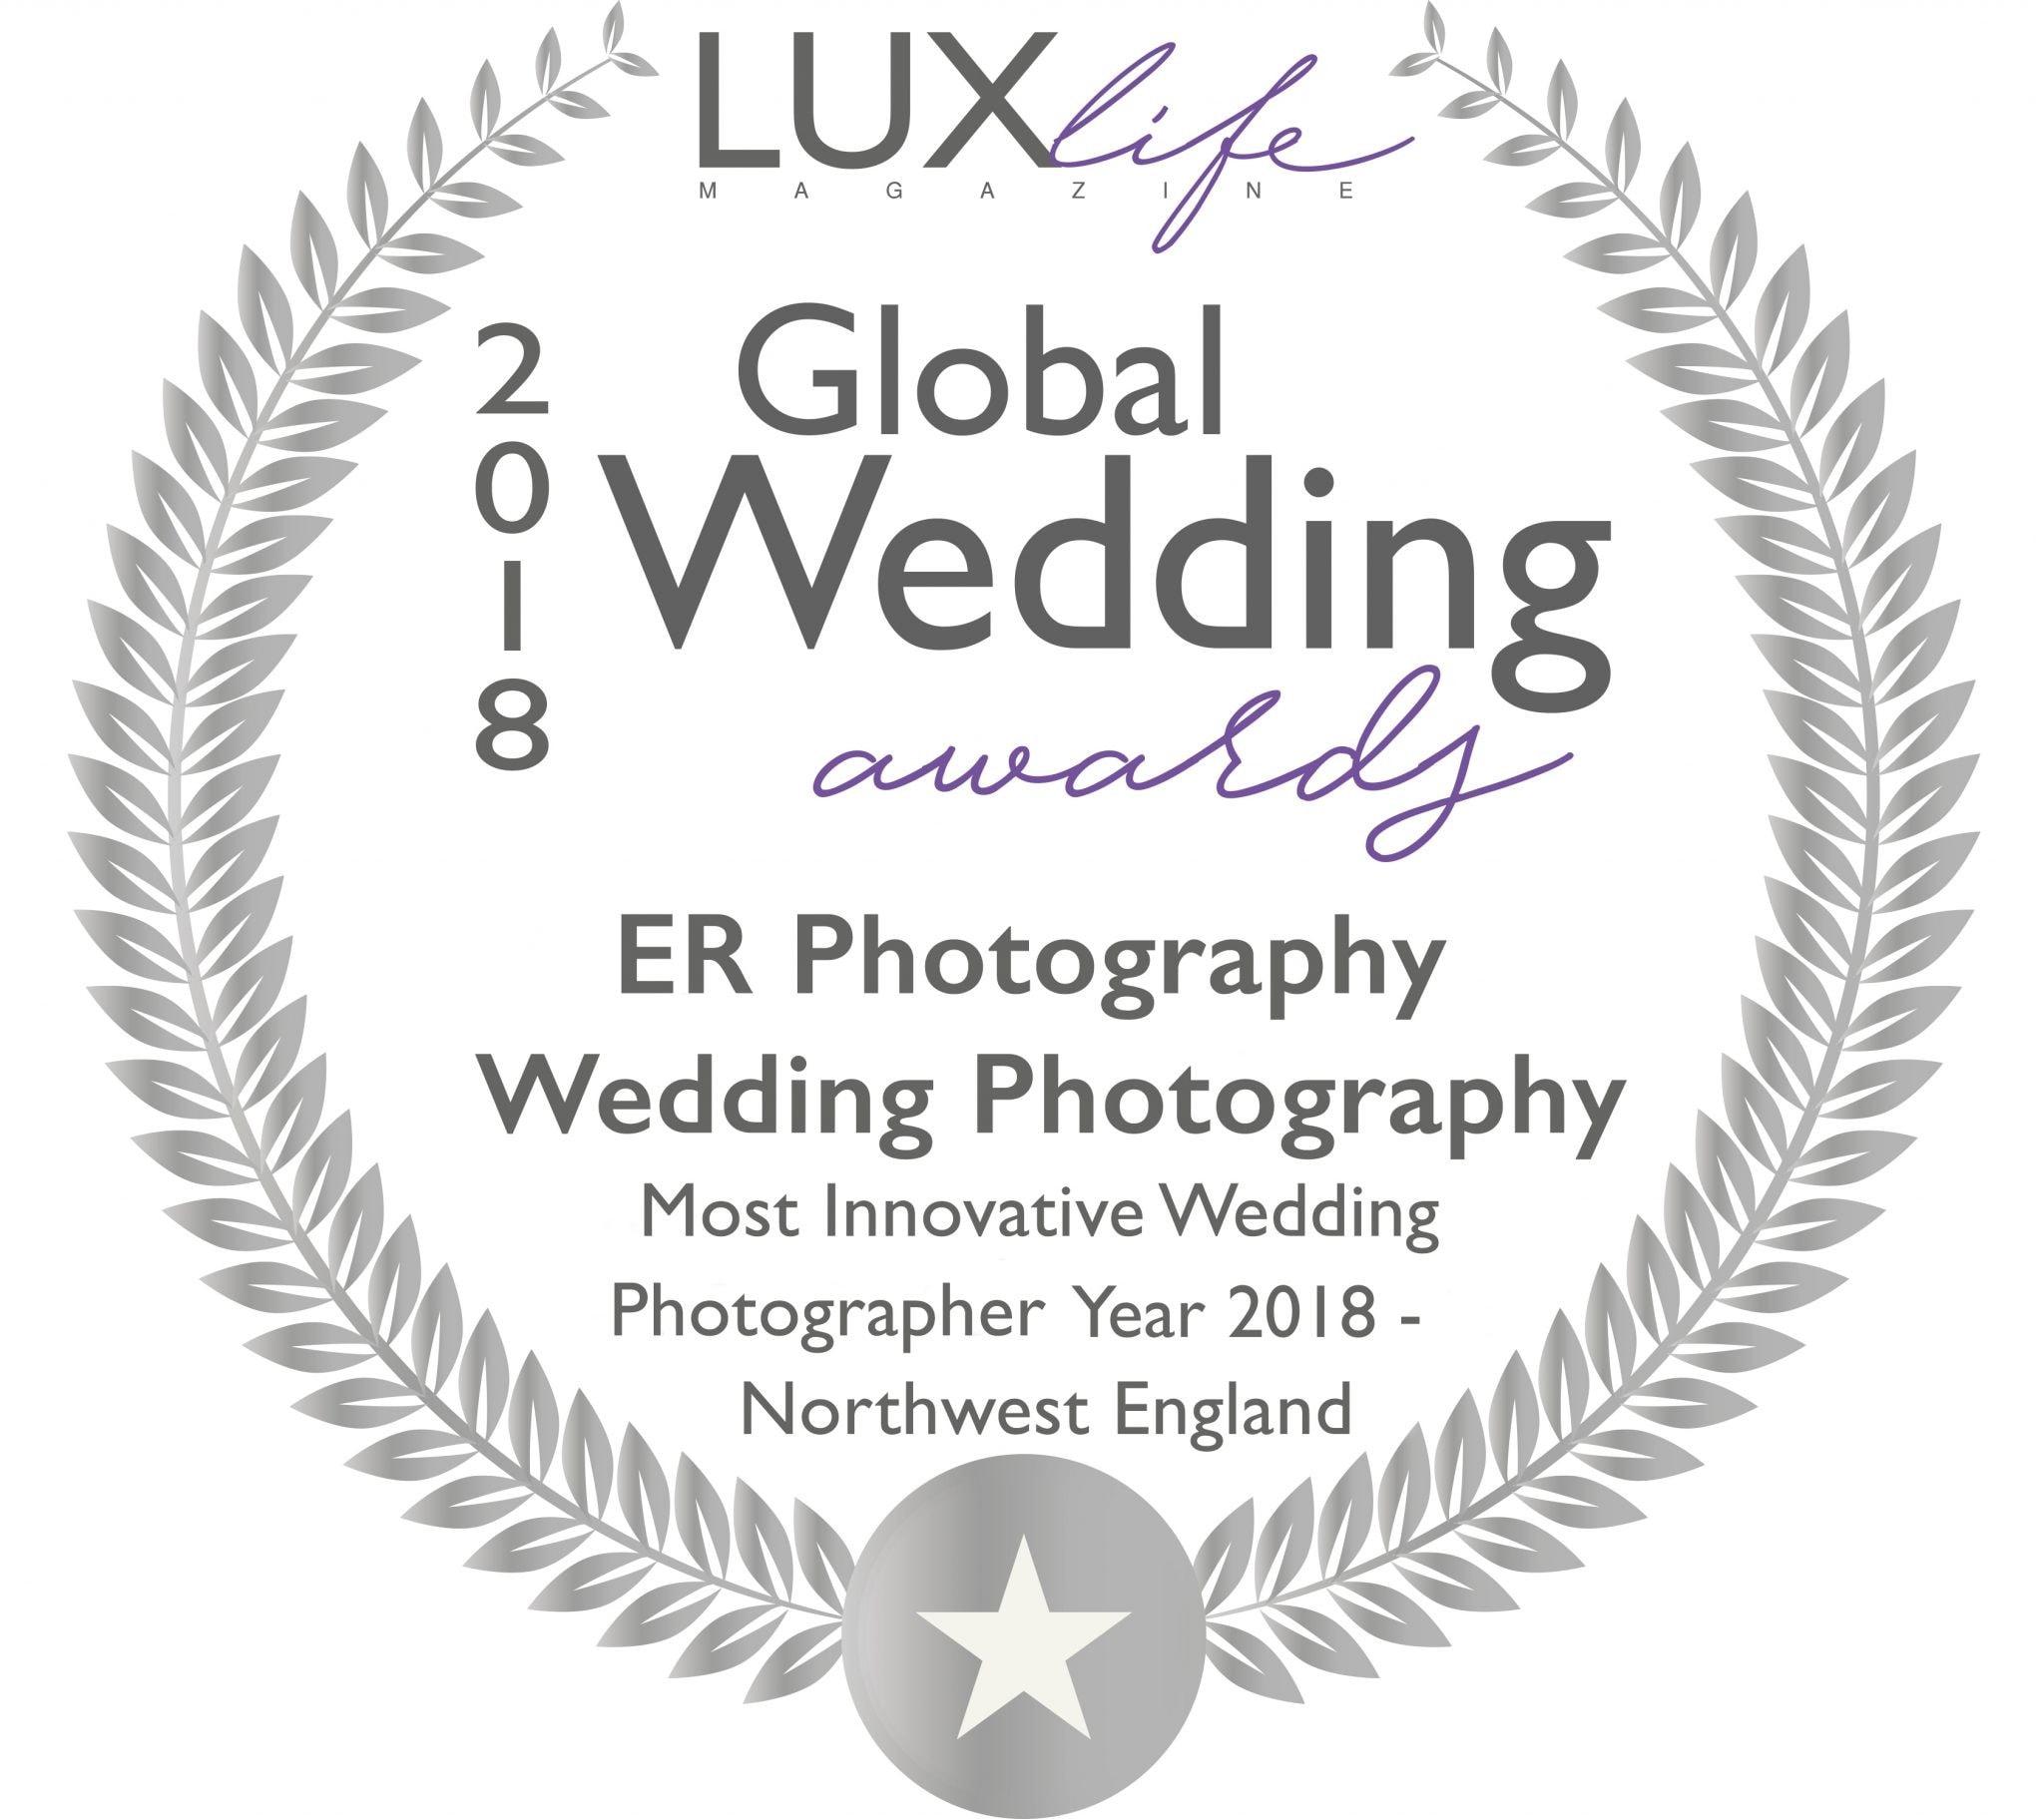 Winner at The Global Wedding Awards 2018